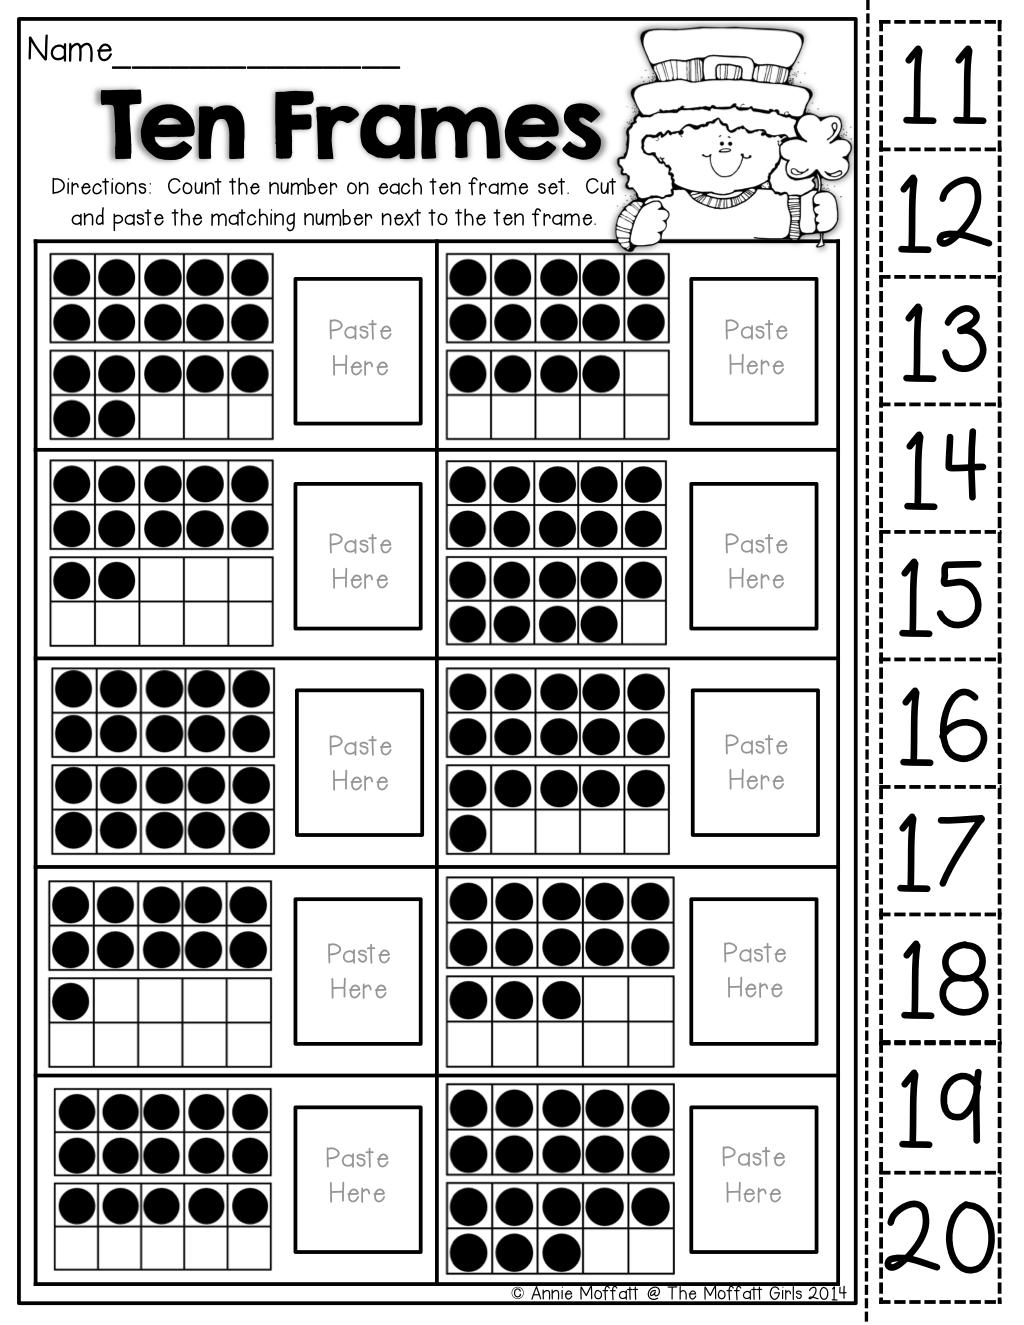 Workbooks ten frame worksheets printables : Ten Frames (cut and paste!) | Teaching ideas | Pinterest | Ten ...